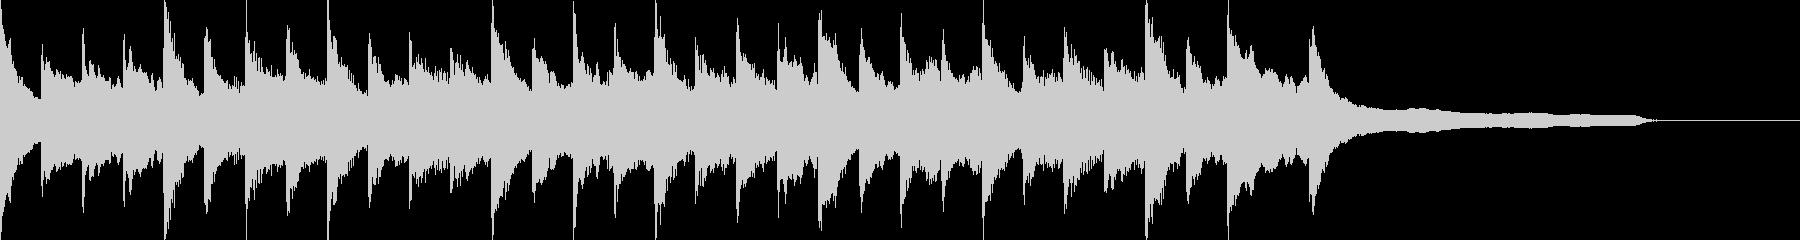 Cinematic Piano&Strings 4の未再生の波形